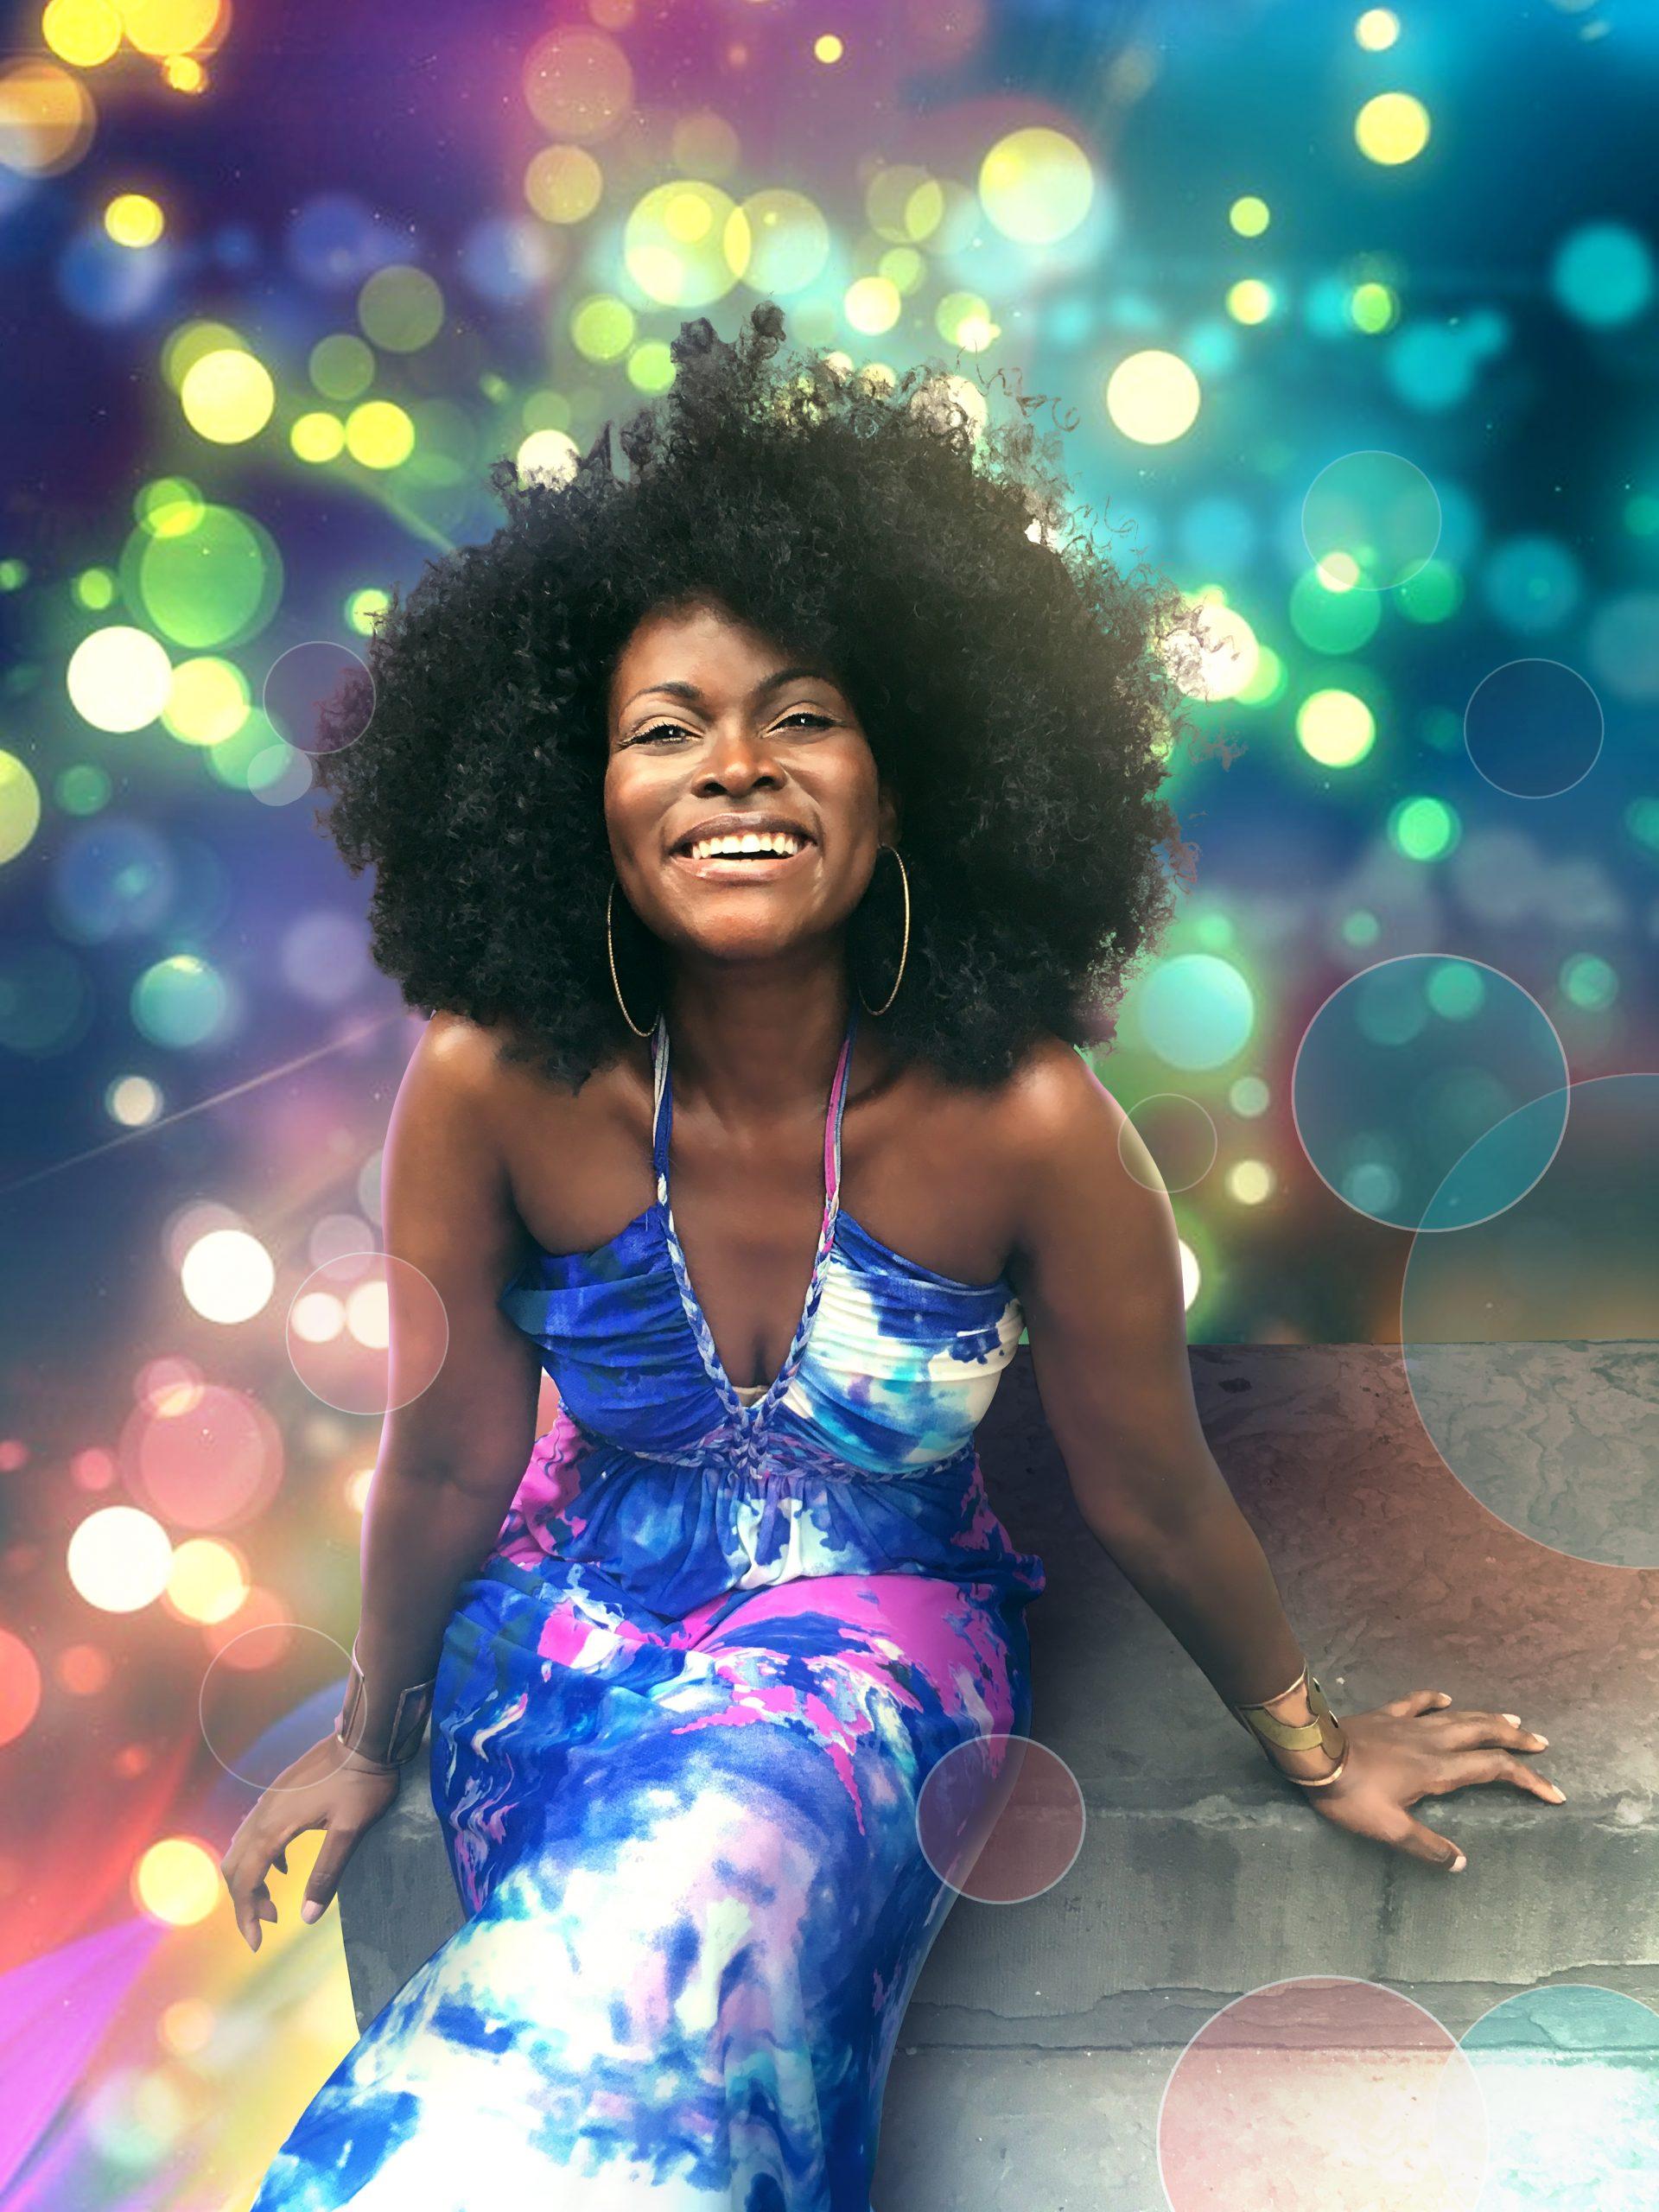 Lifestyle Expert Abiola Abrams